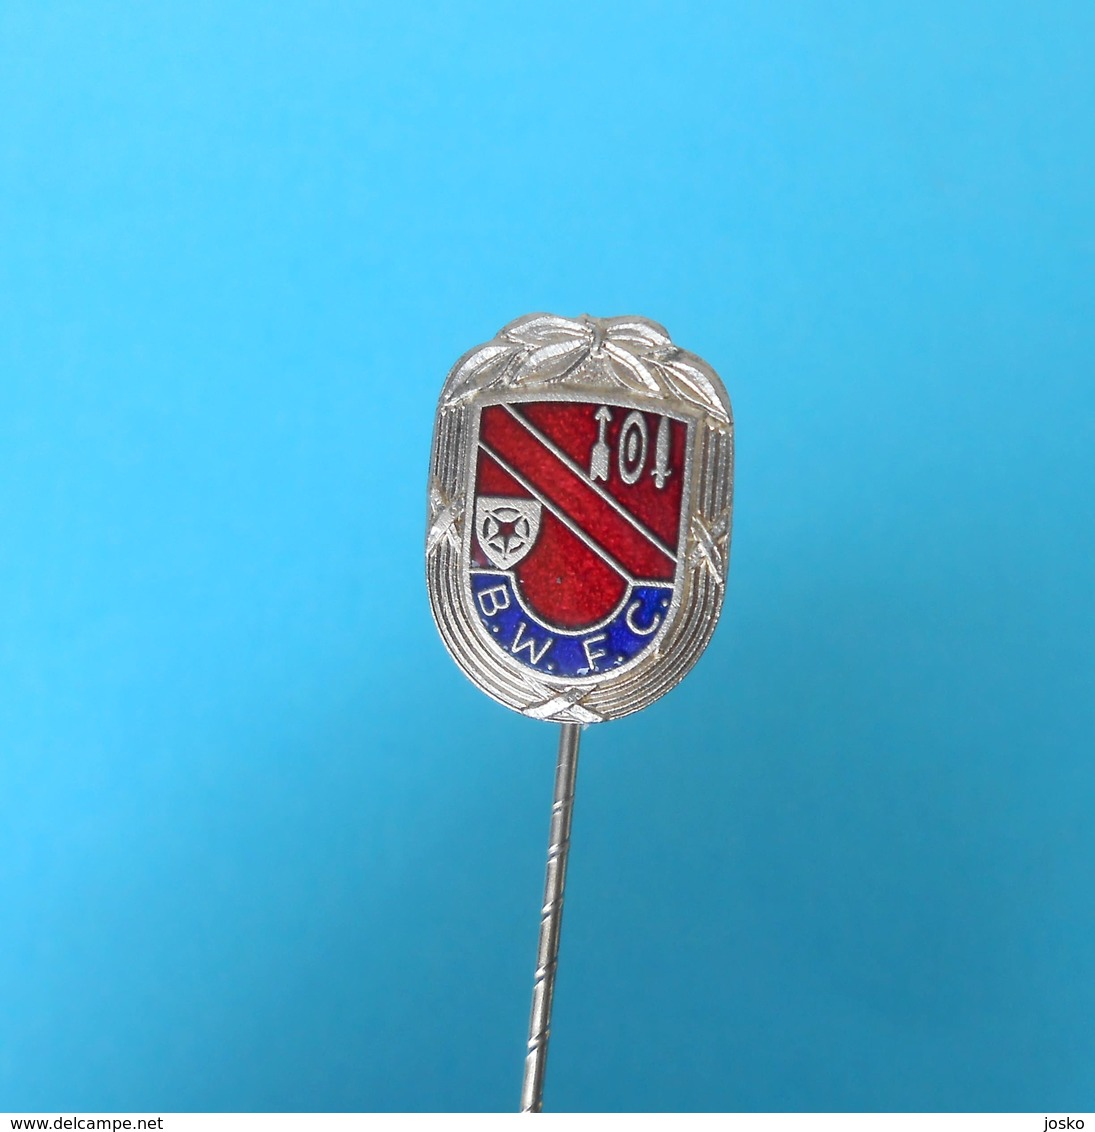 BOLTON WANDERERS FC - England Football Soccer Club Old Enamel Pin Badge Fussball Calcio Futbol Futebol Foot British - Football